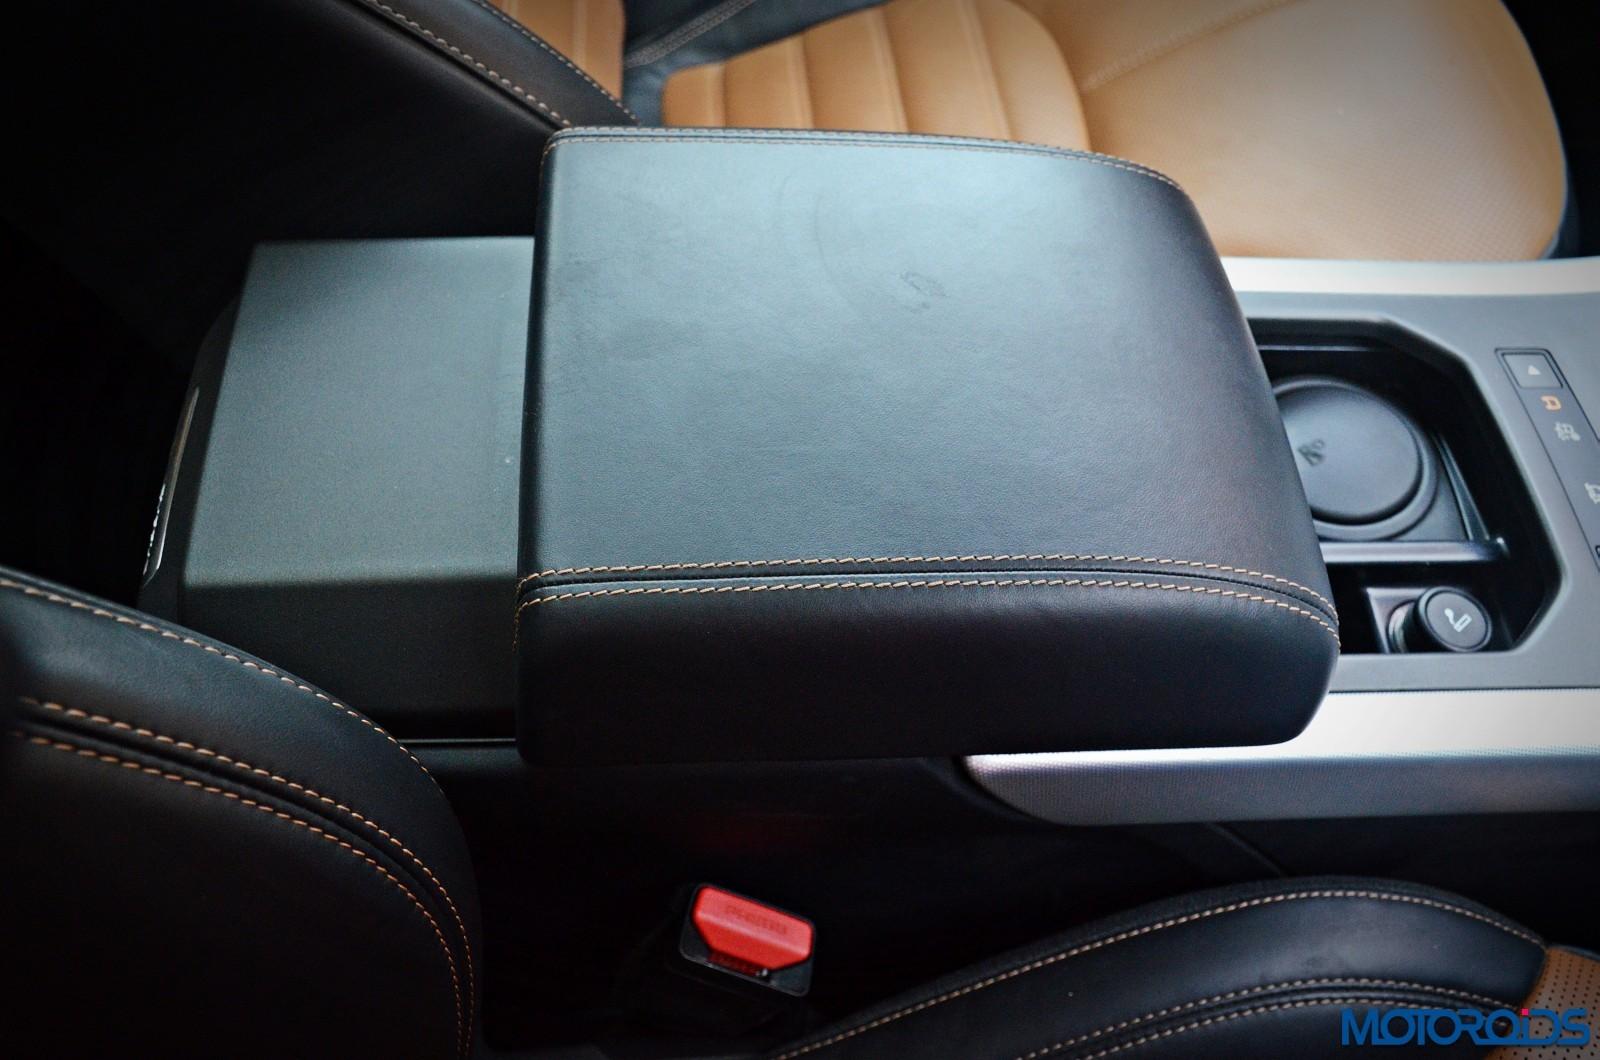 Range-Rover-Evoque-front-armrest-1